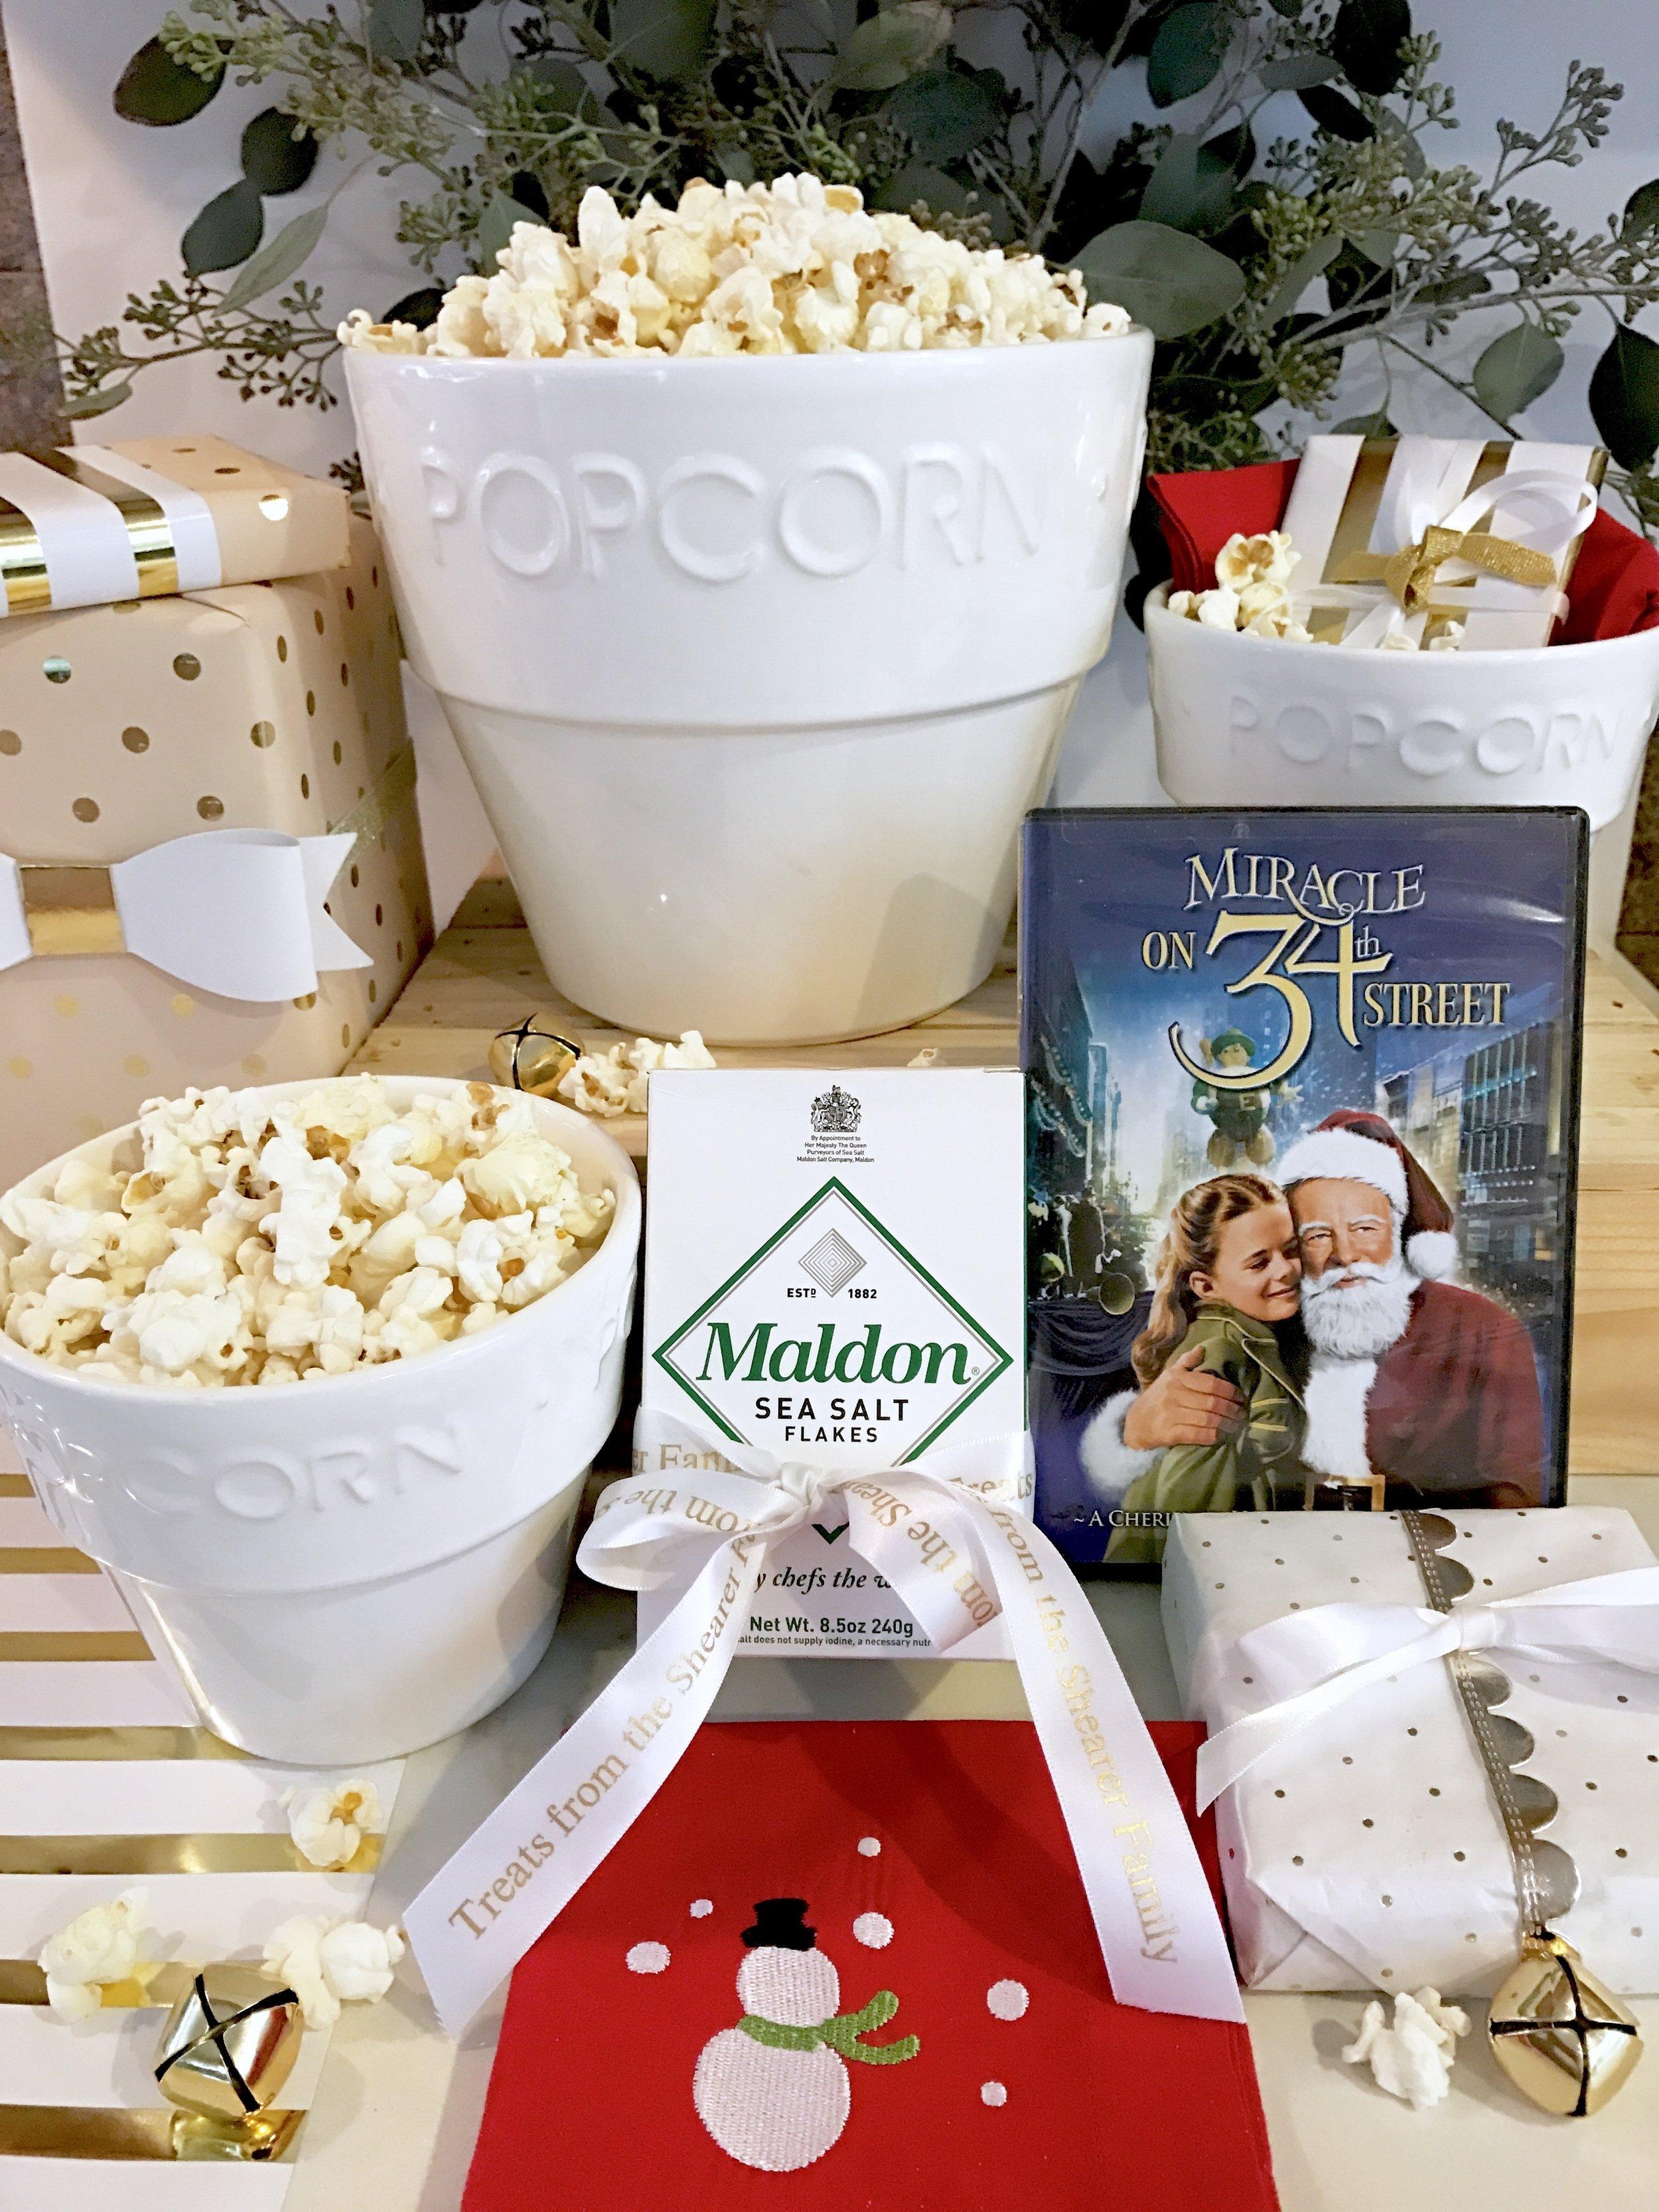 Hostess gifts - Movie & Popcorn